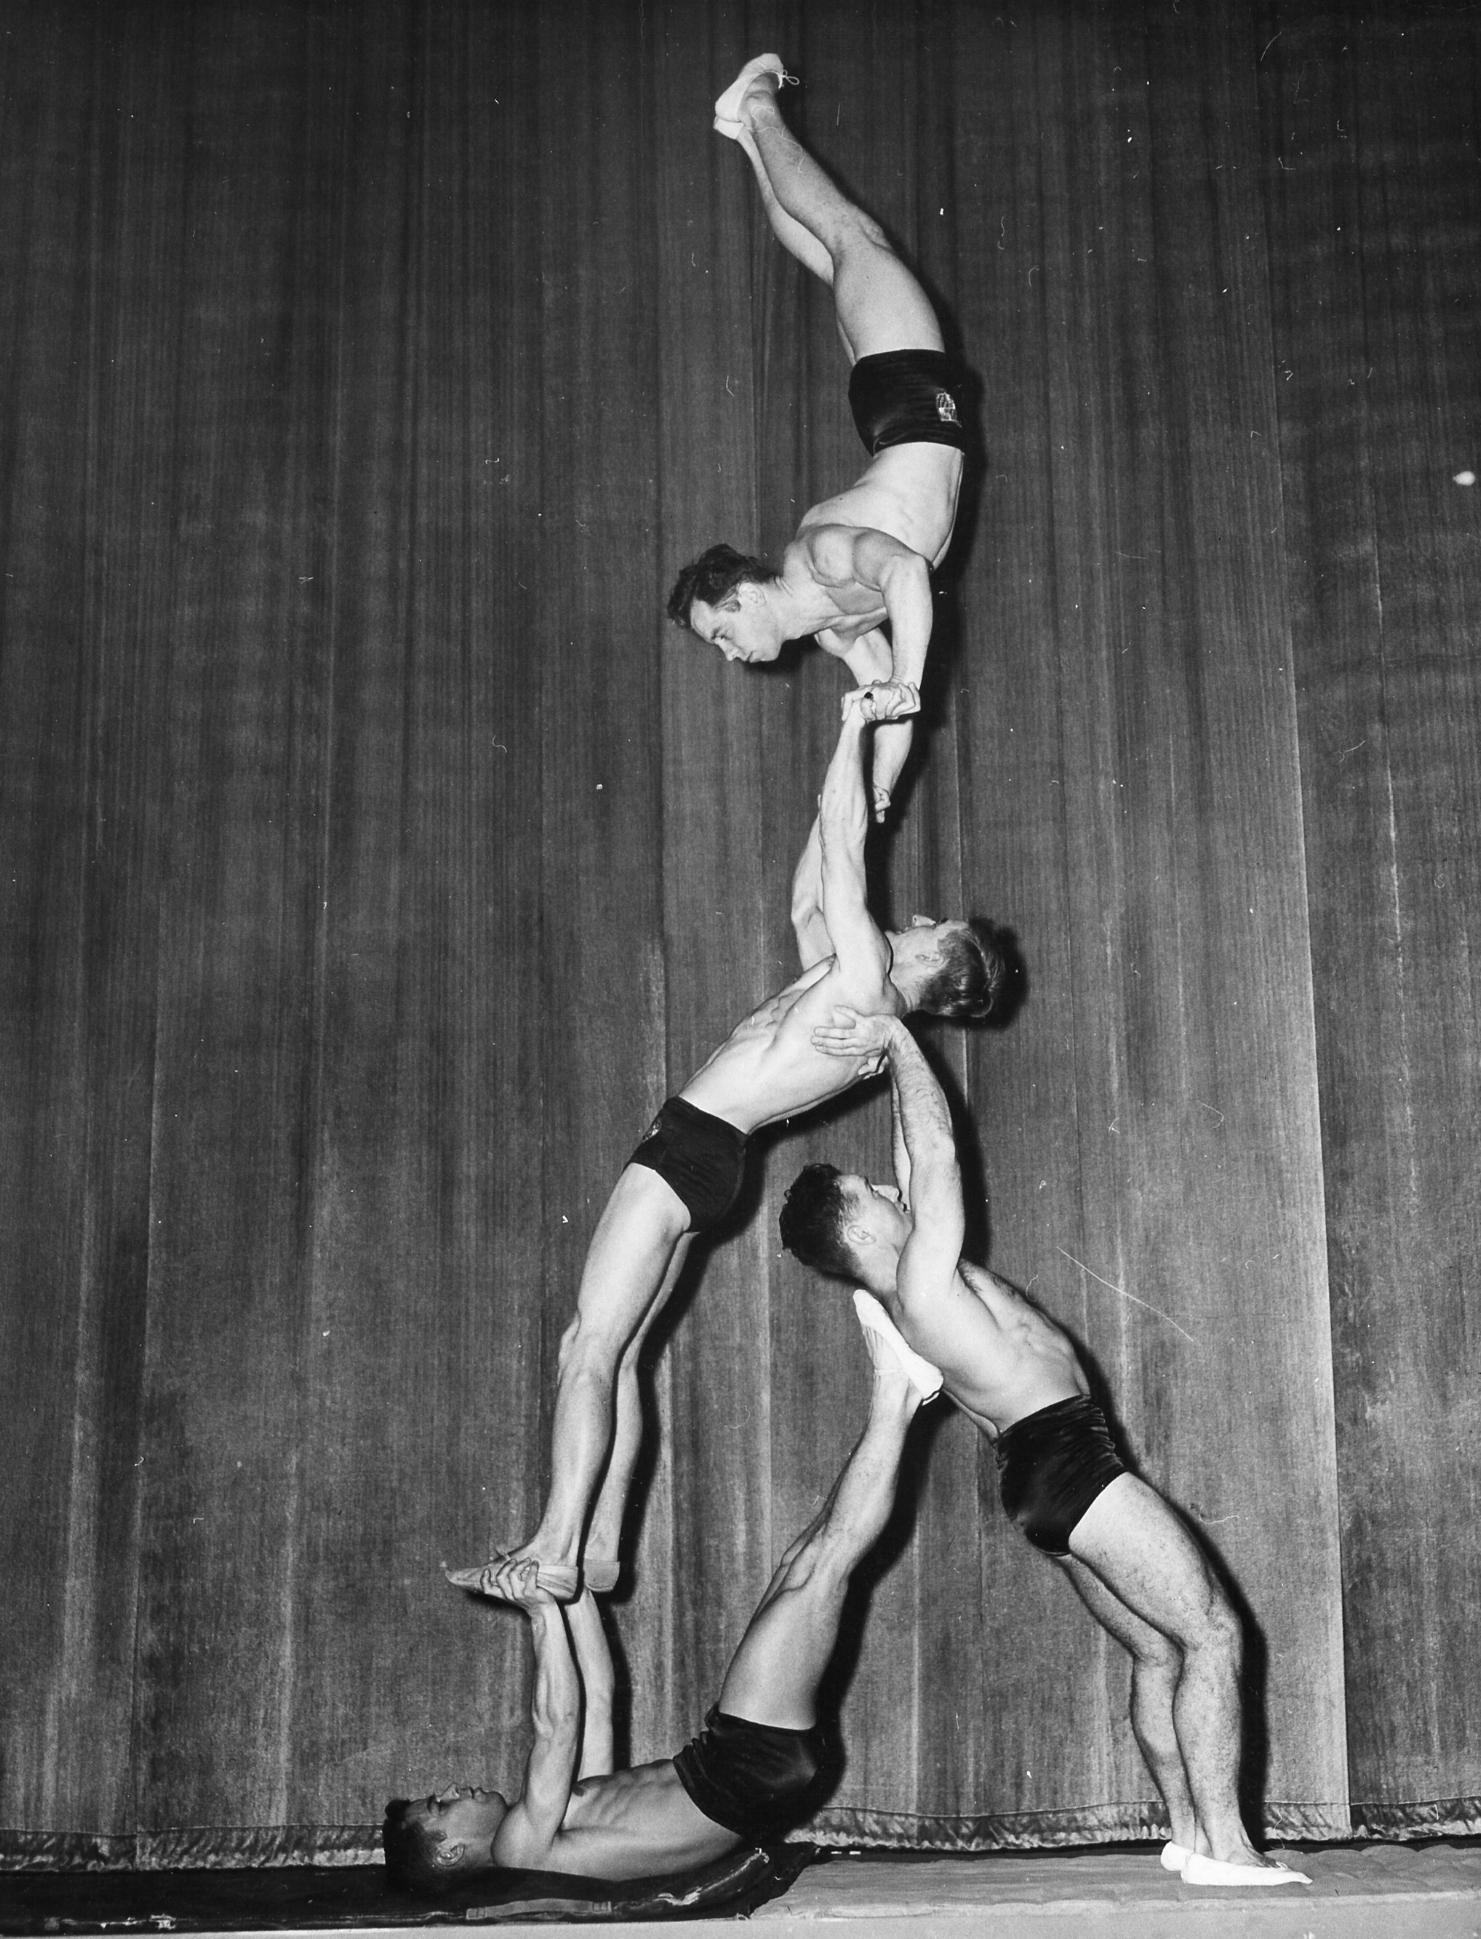 Men's Quads Balancing (1950)